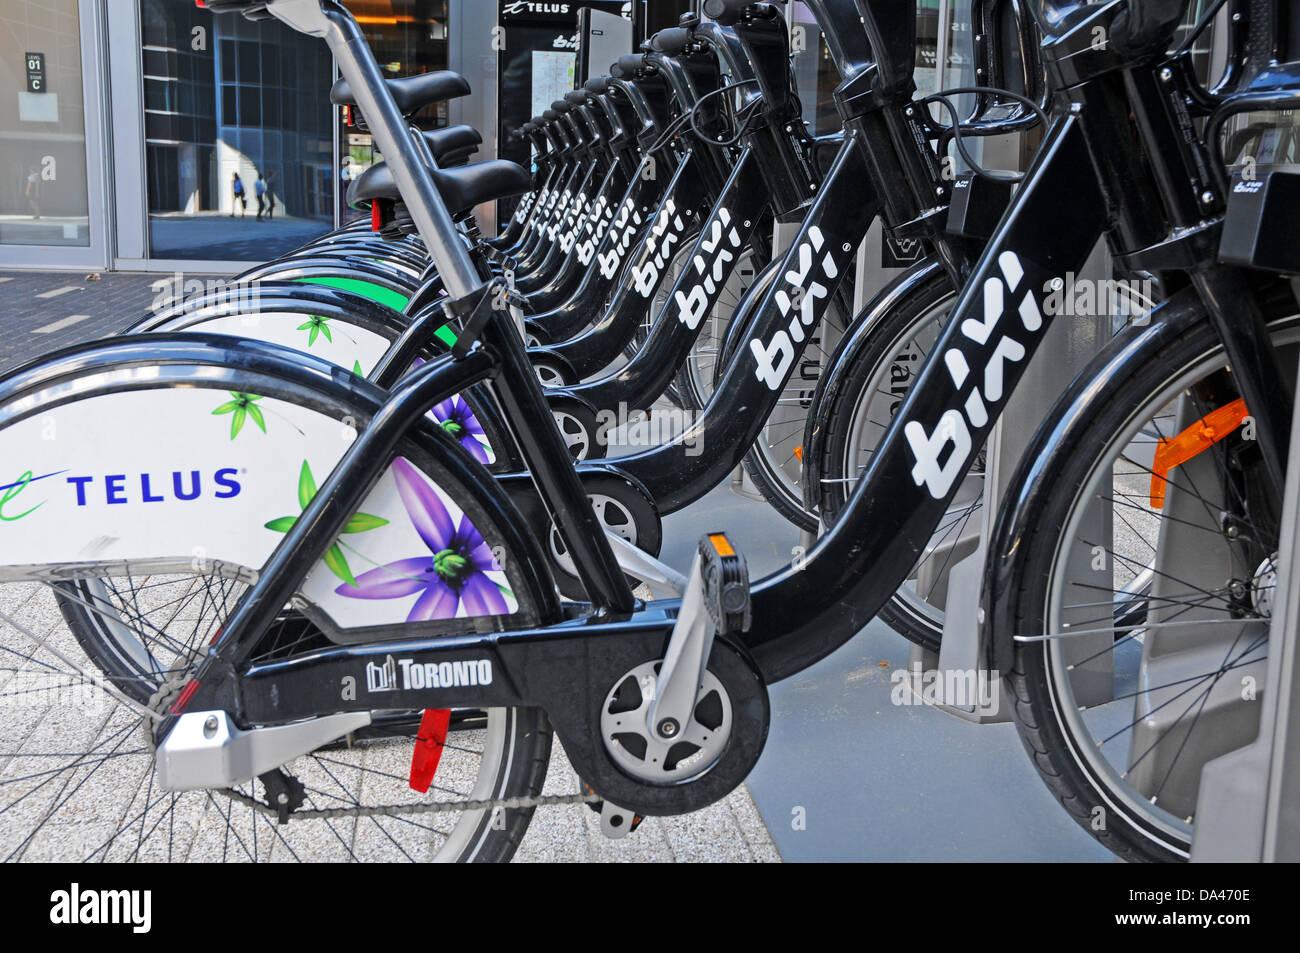 City bikes Toronto - Stock Image